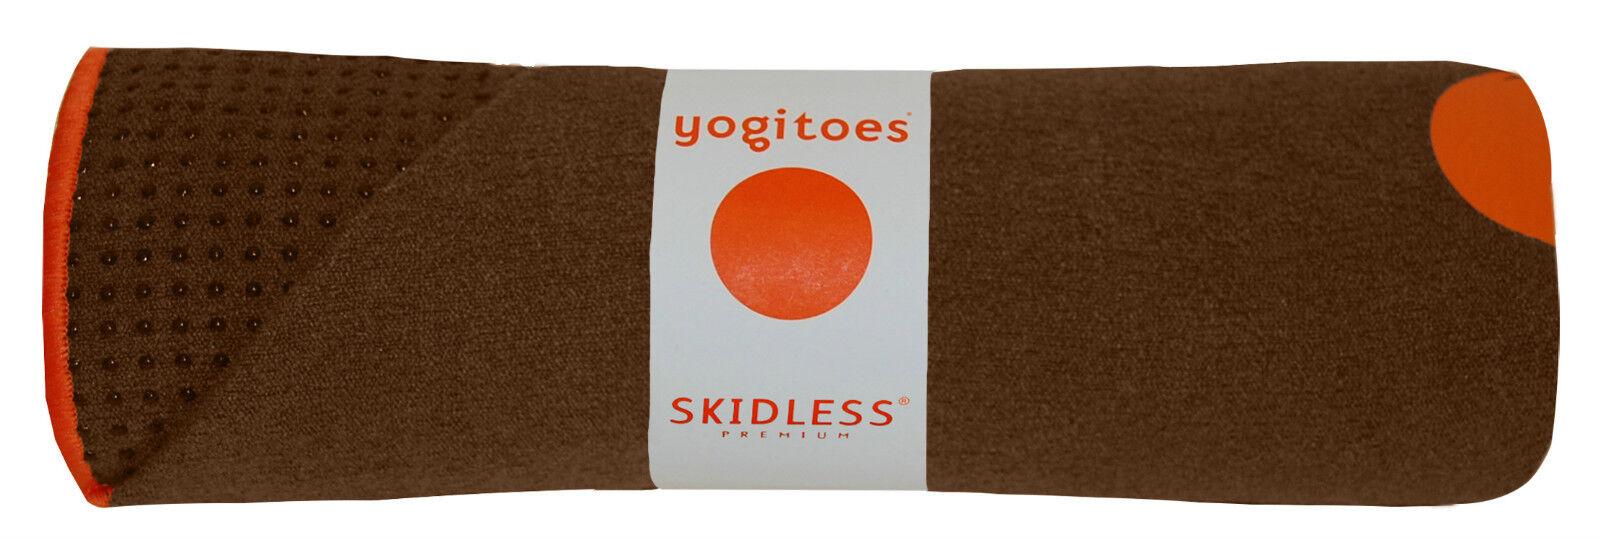 LOAM Yogitoes skidless yoga mat towel 24 x 68 MANDUKA FAST SHIP SHIP